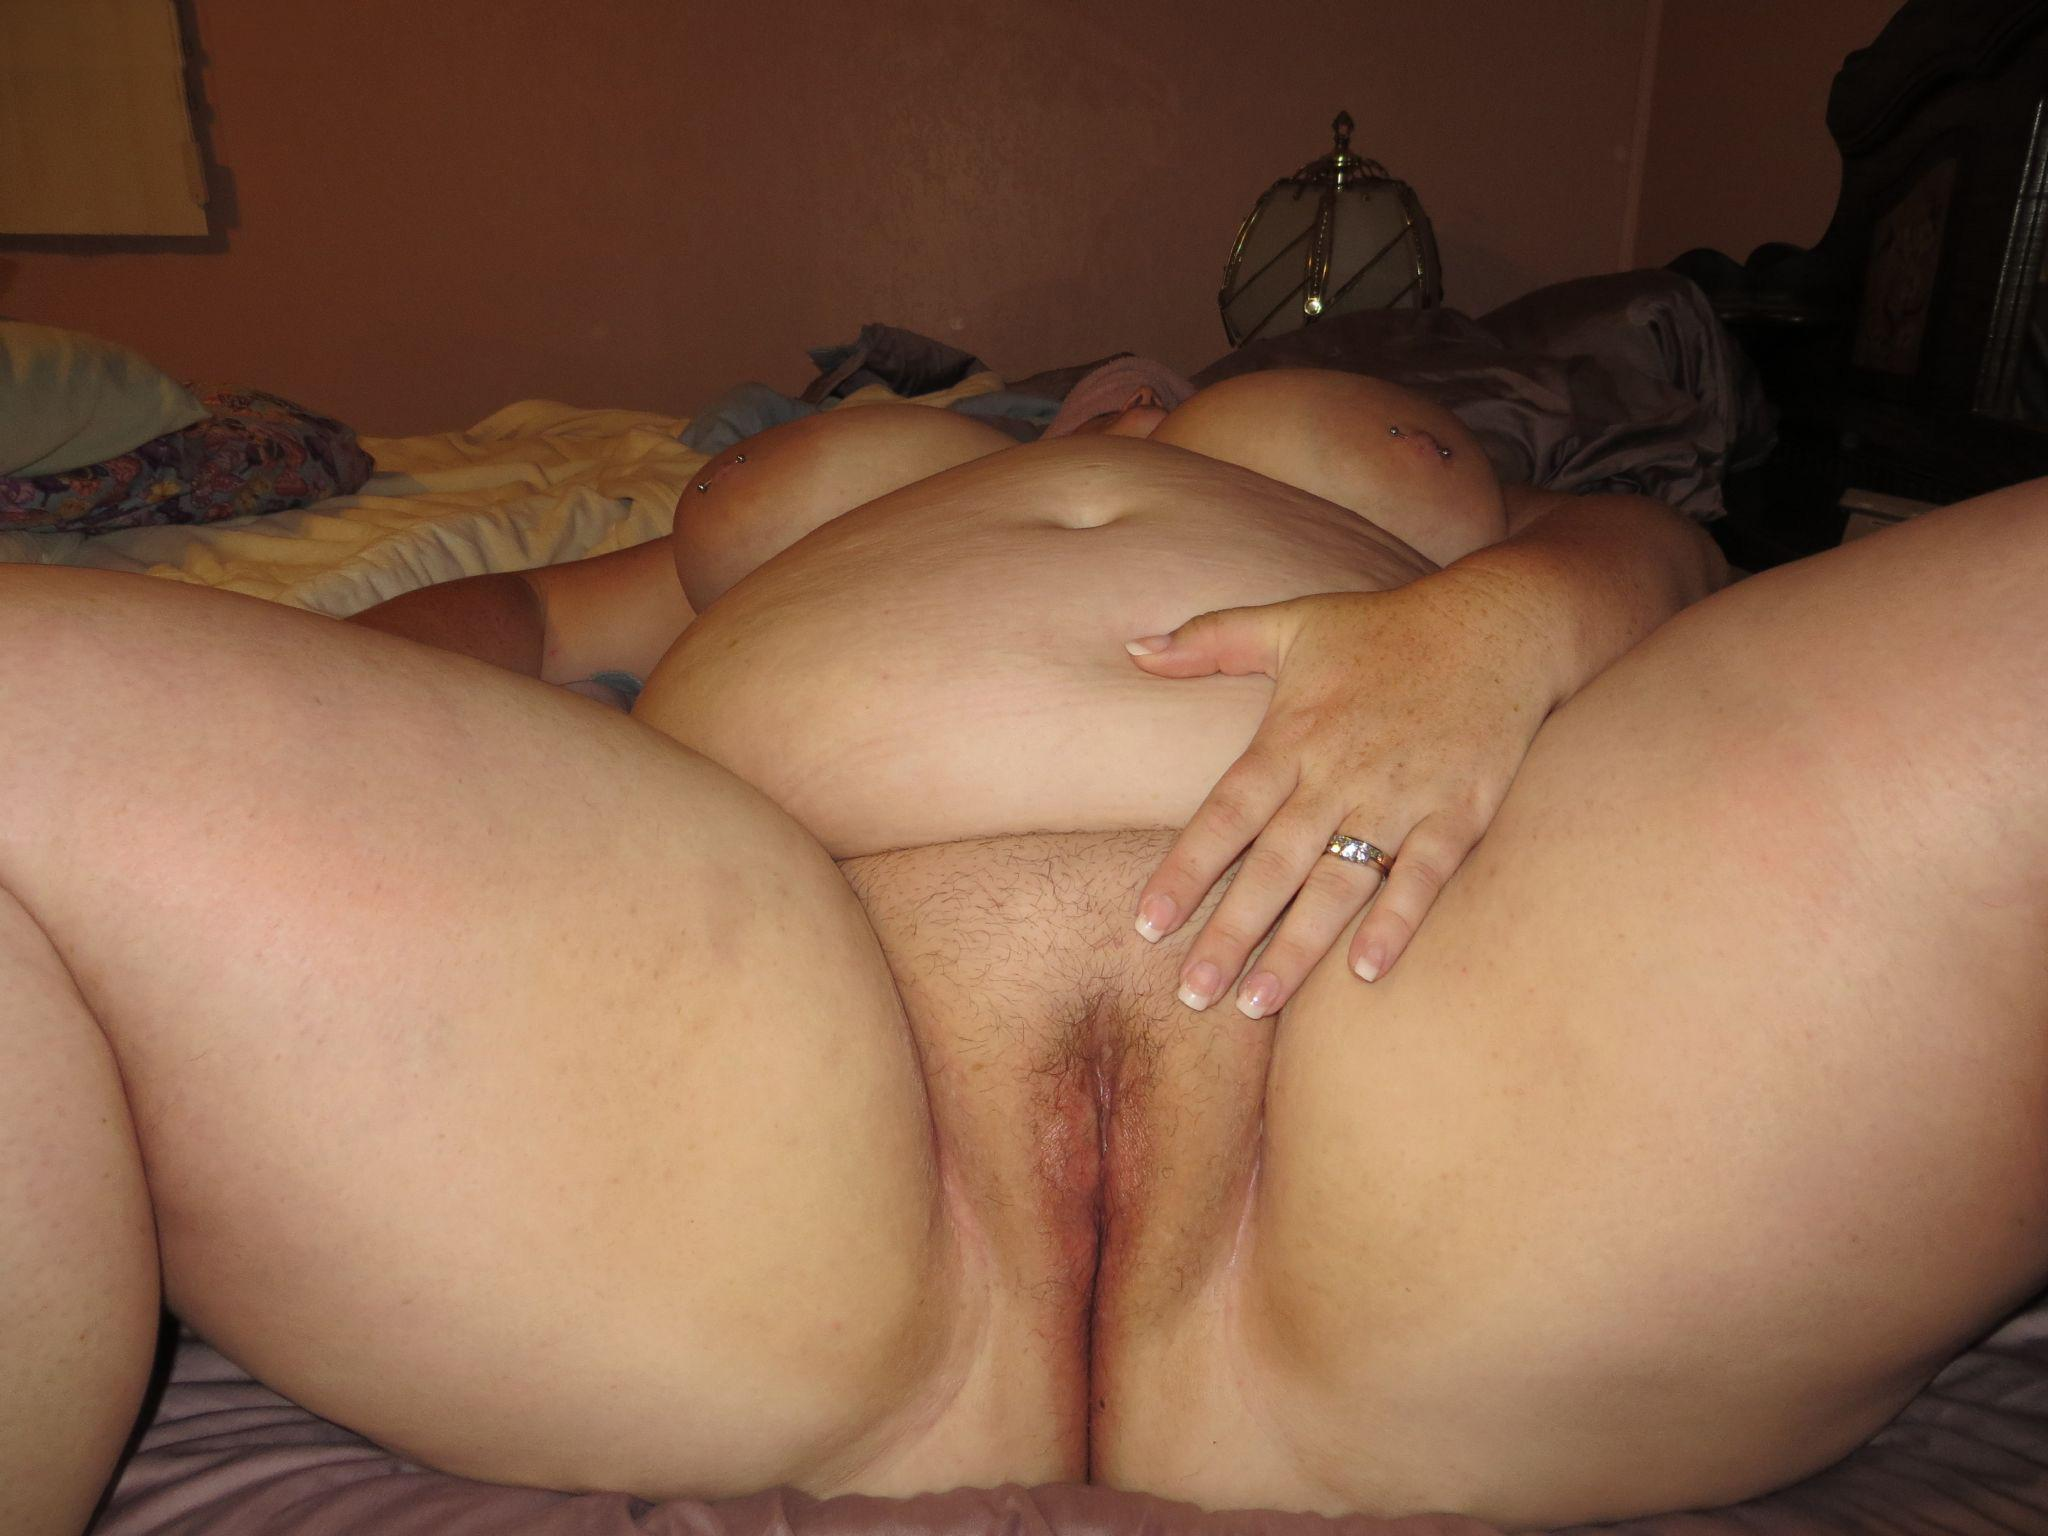 Fat white bbc pig 18 yo bitch named autumn i met on meetme 6 3